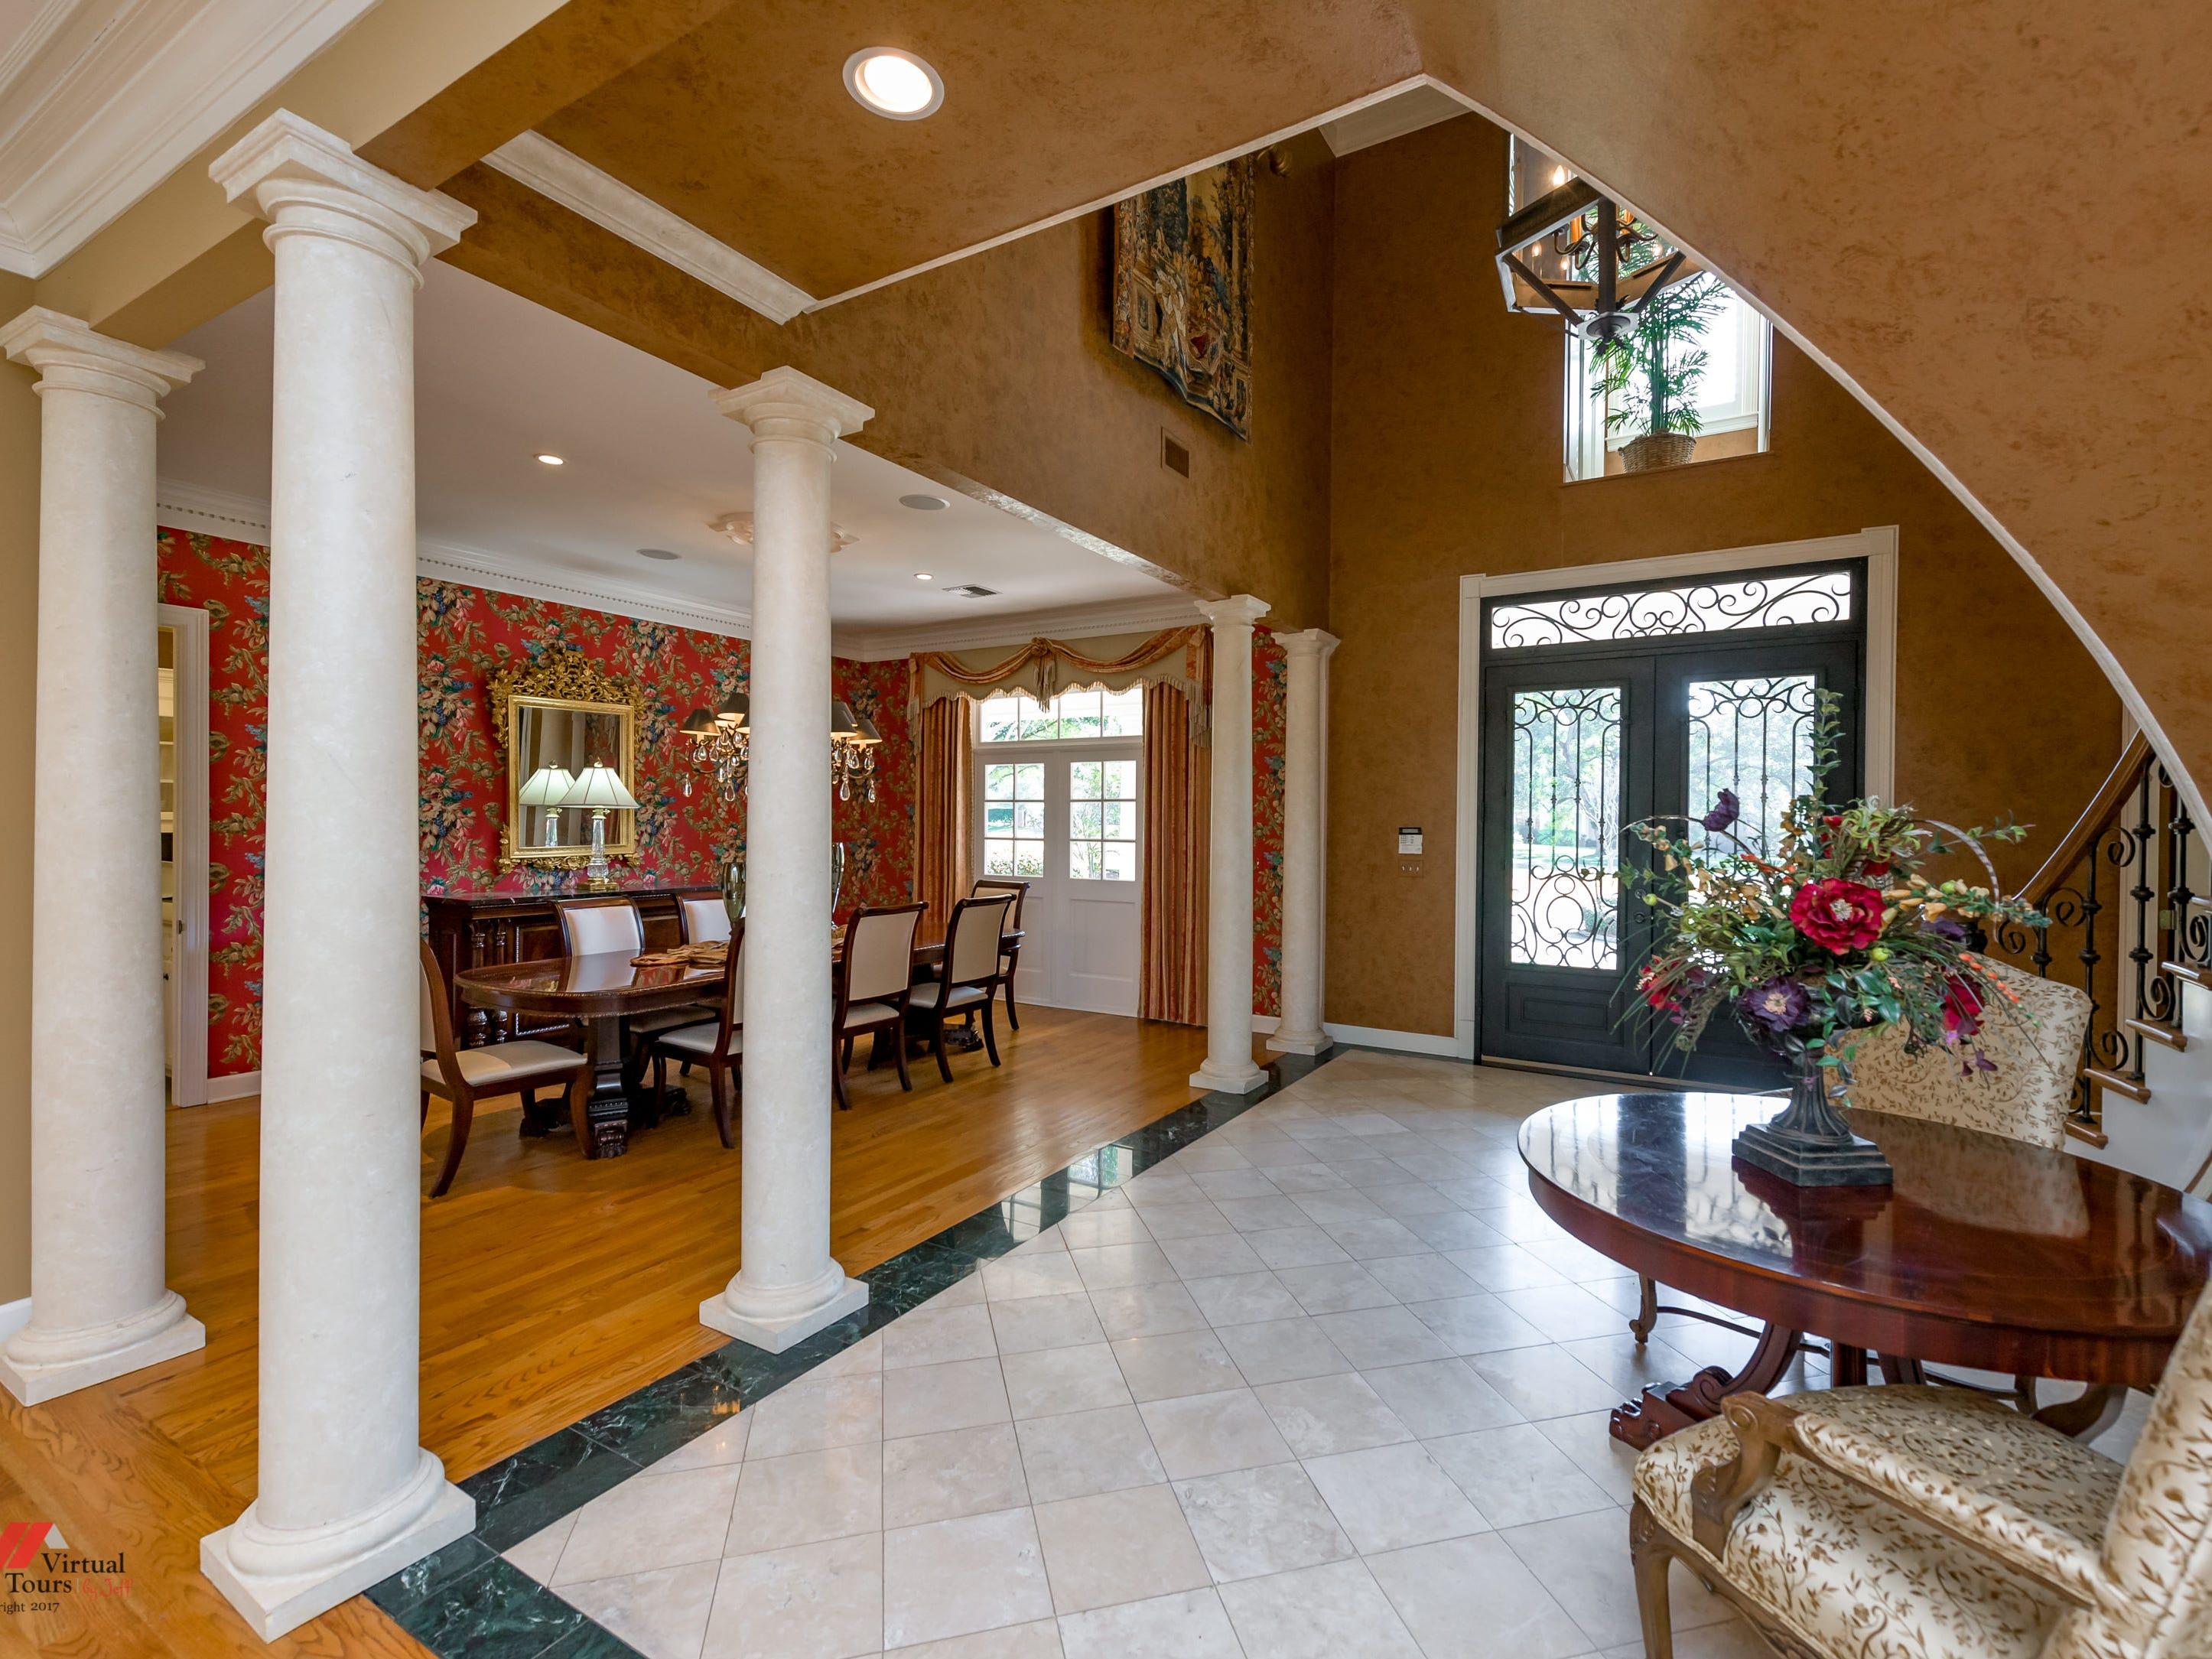 Mansion on the Market: 459 Railsback